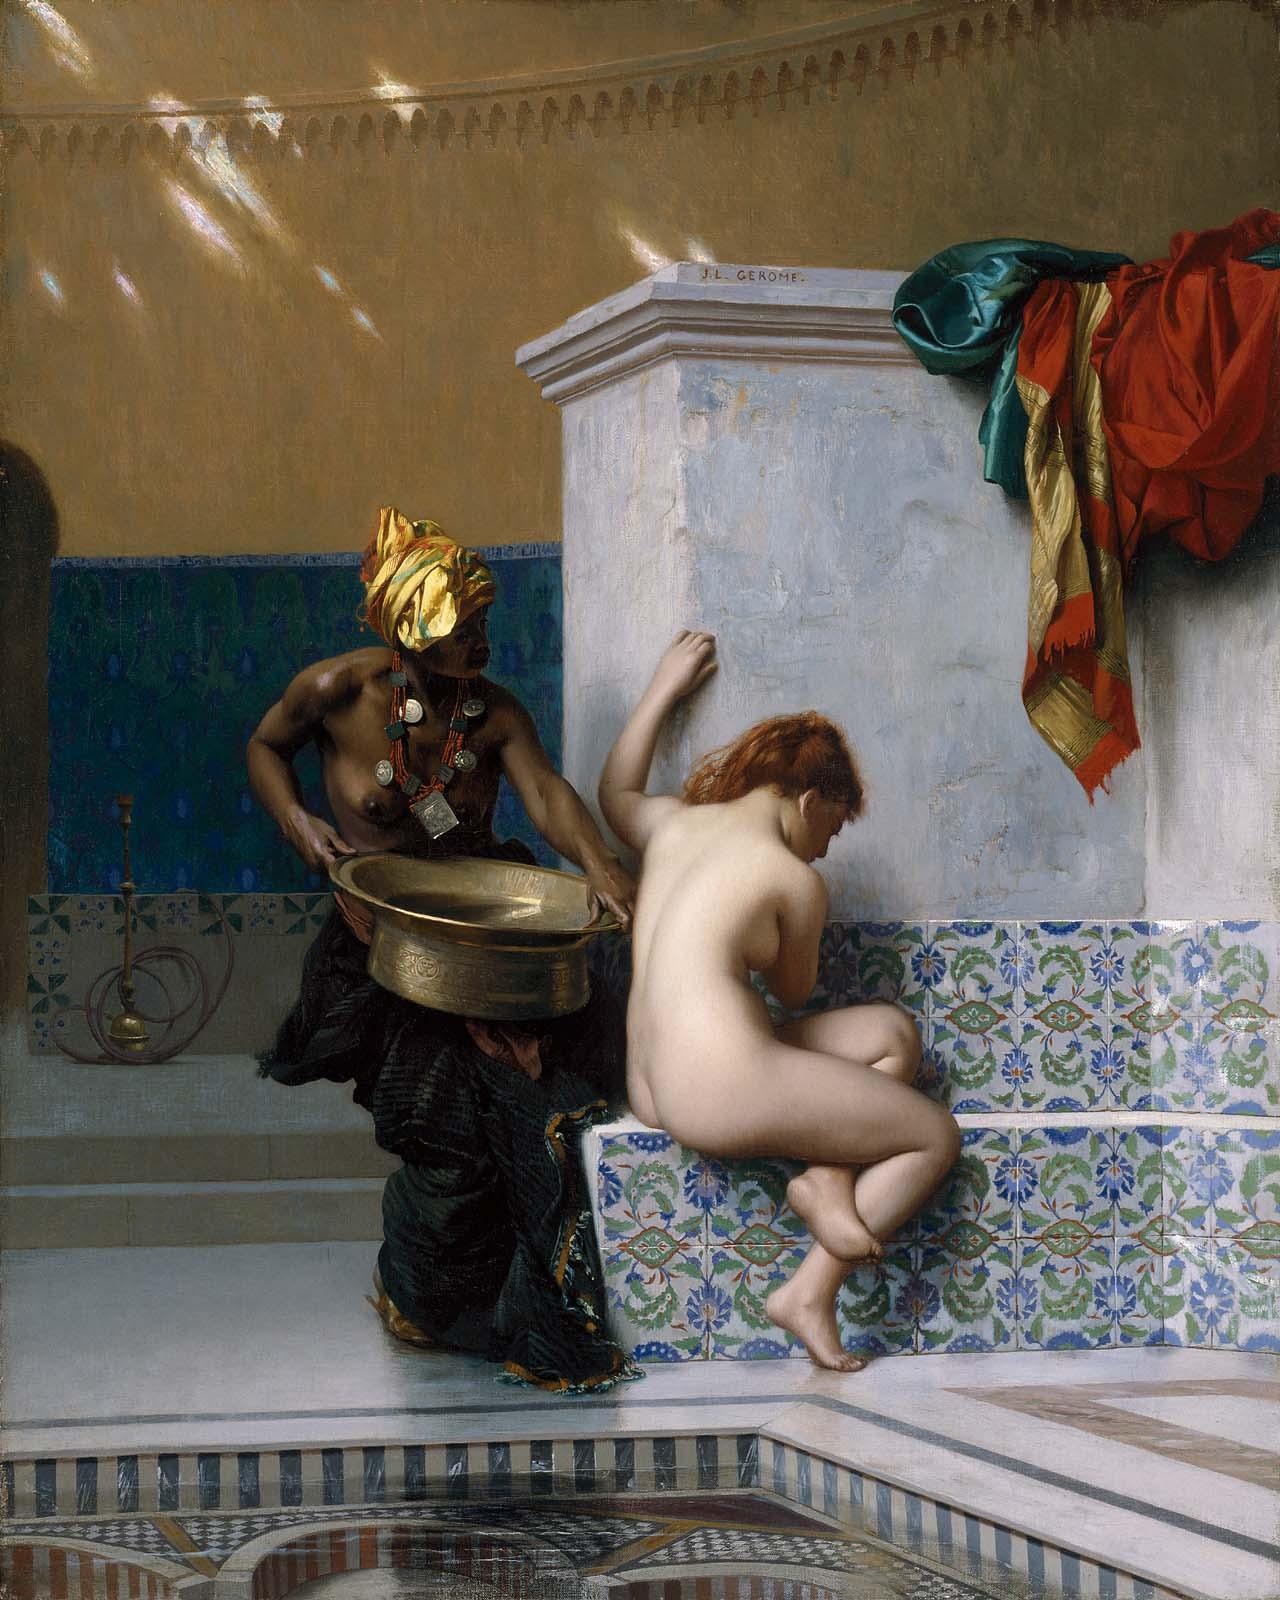 Jean-Léon Gérôme: Moorish bath, 1870. Olaj, vászon, 50 x 40 cm. Museum of Fine Arts, Boston.